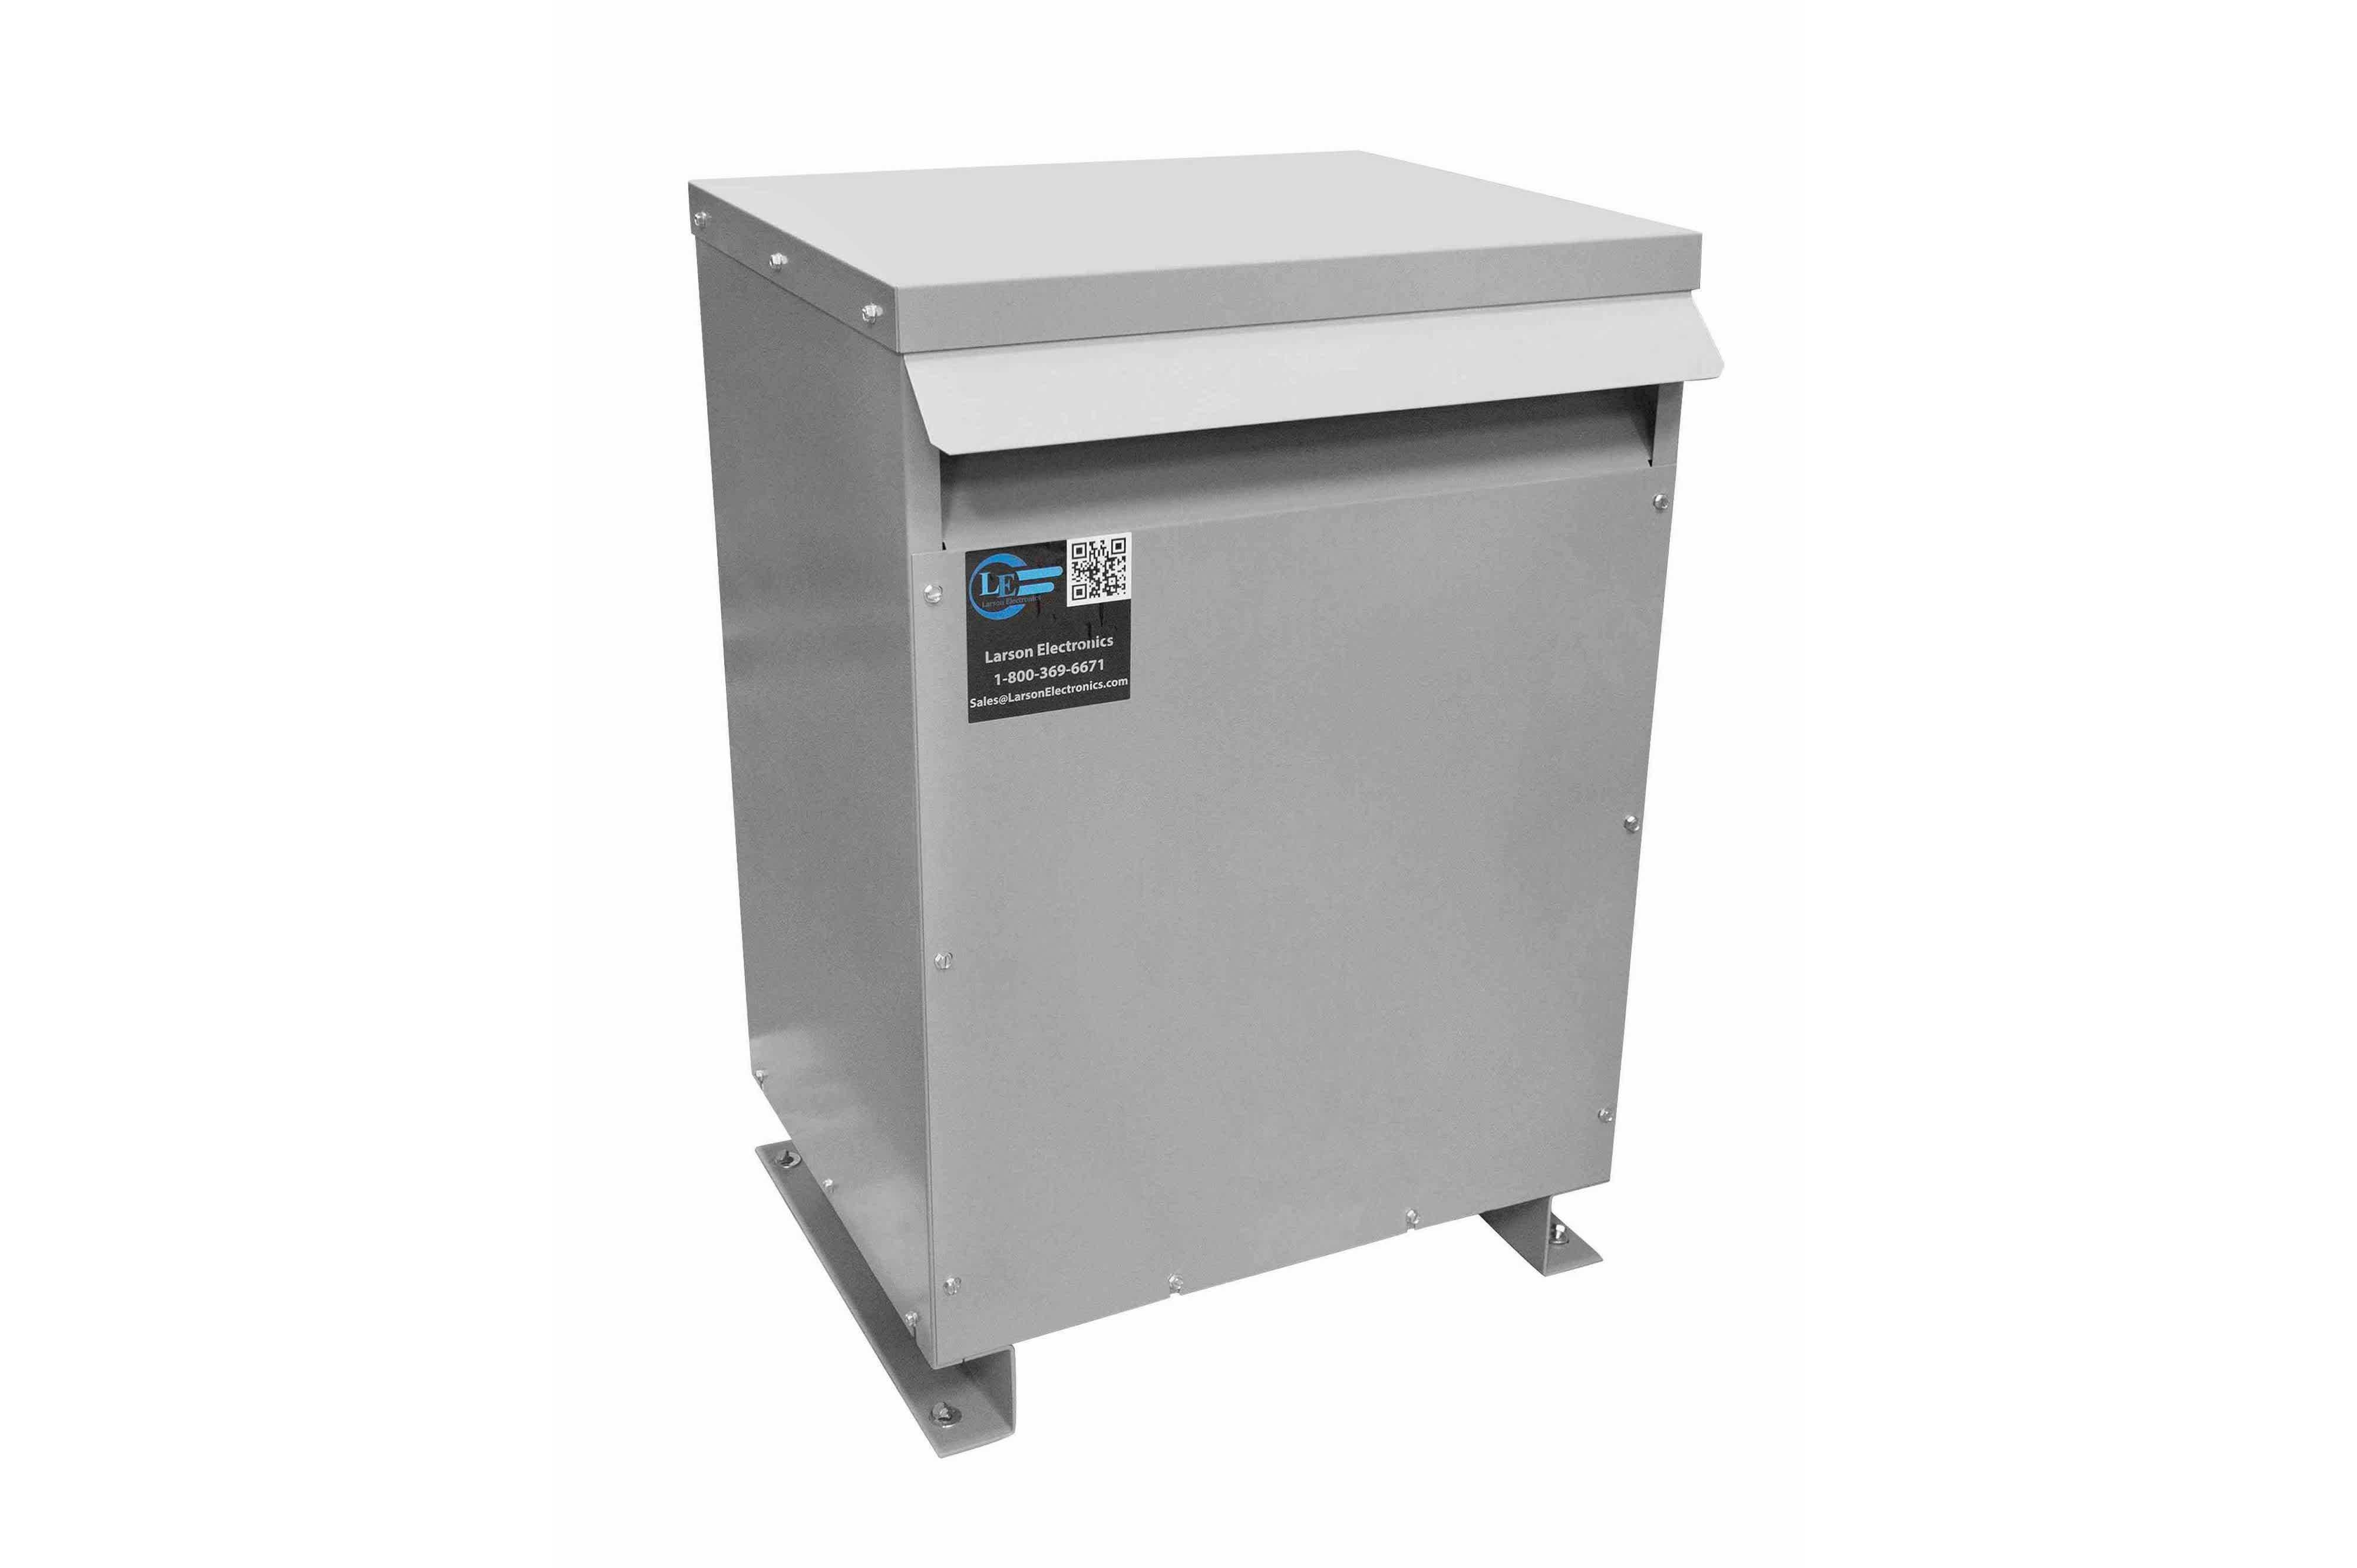 36 kVA 3PH Isolation Transformer, 480V Wye Primary, 240V Delta Secondary, N3R, Ventilated, 60 Hz